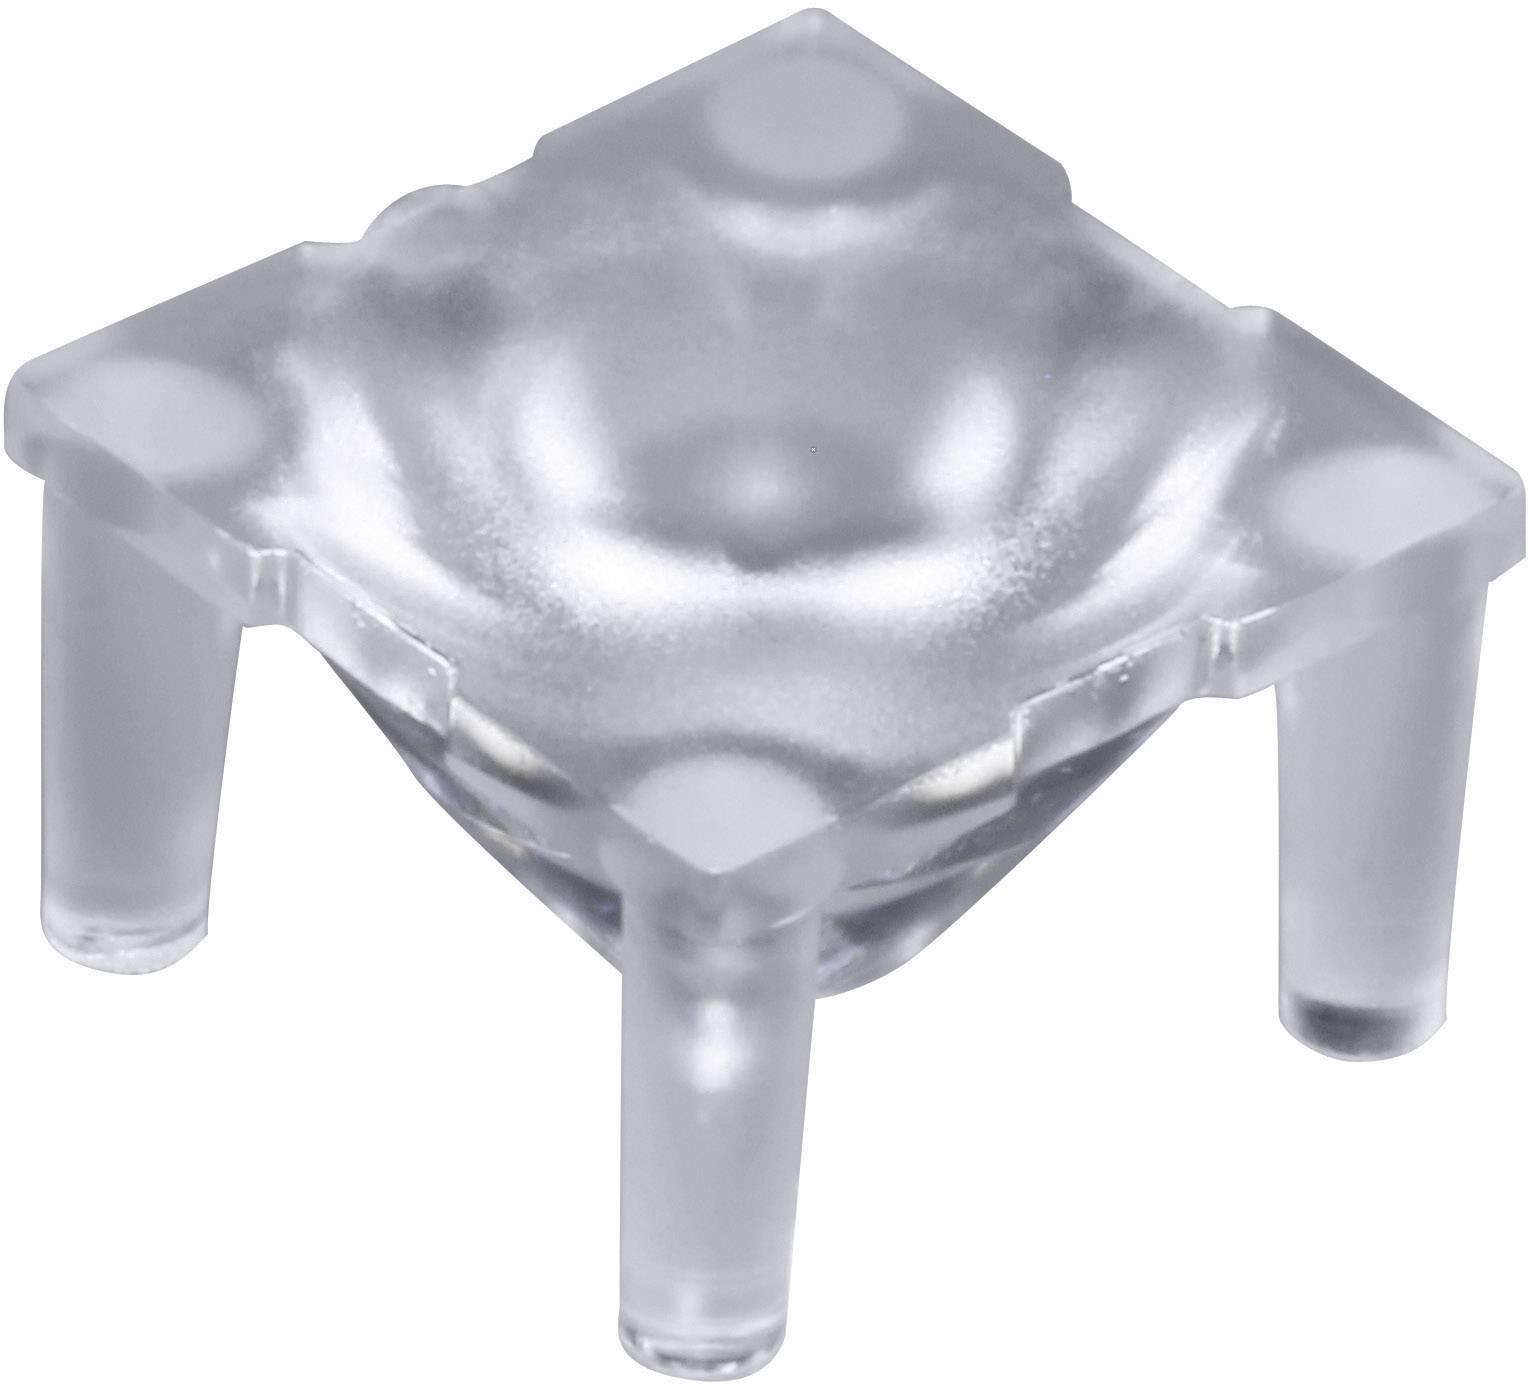 Optika pro Luxeon ® Rebel nebo Seoul Semiconductor ® Z5 Carclo 10414, 40.6°